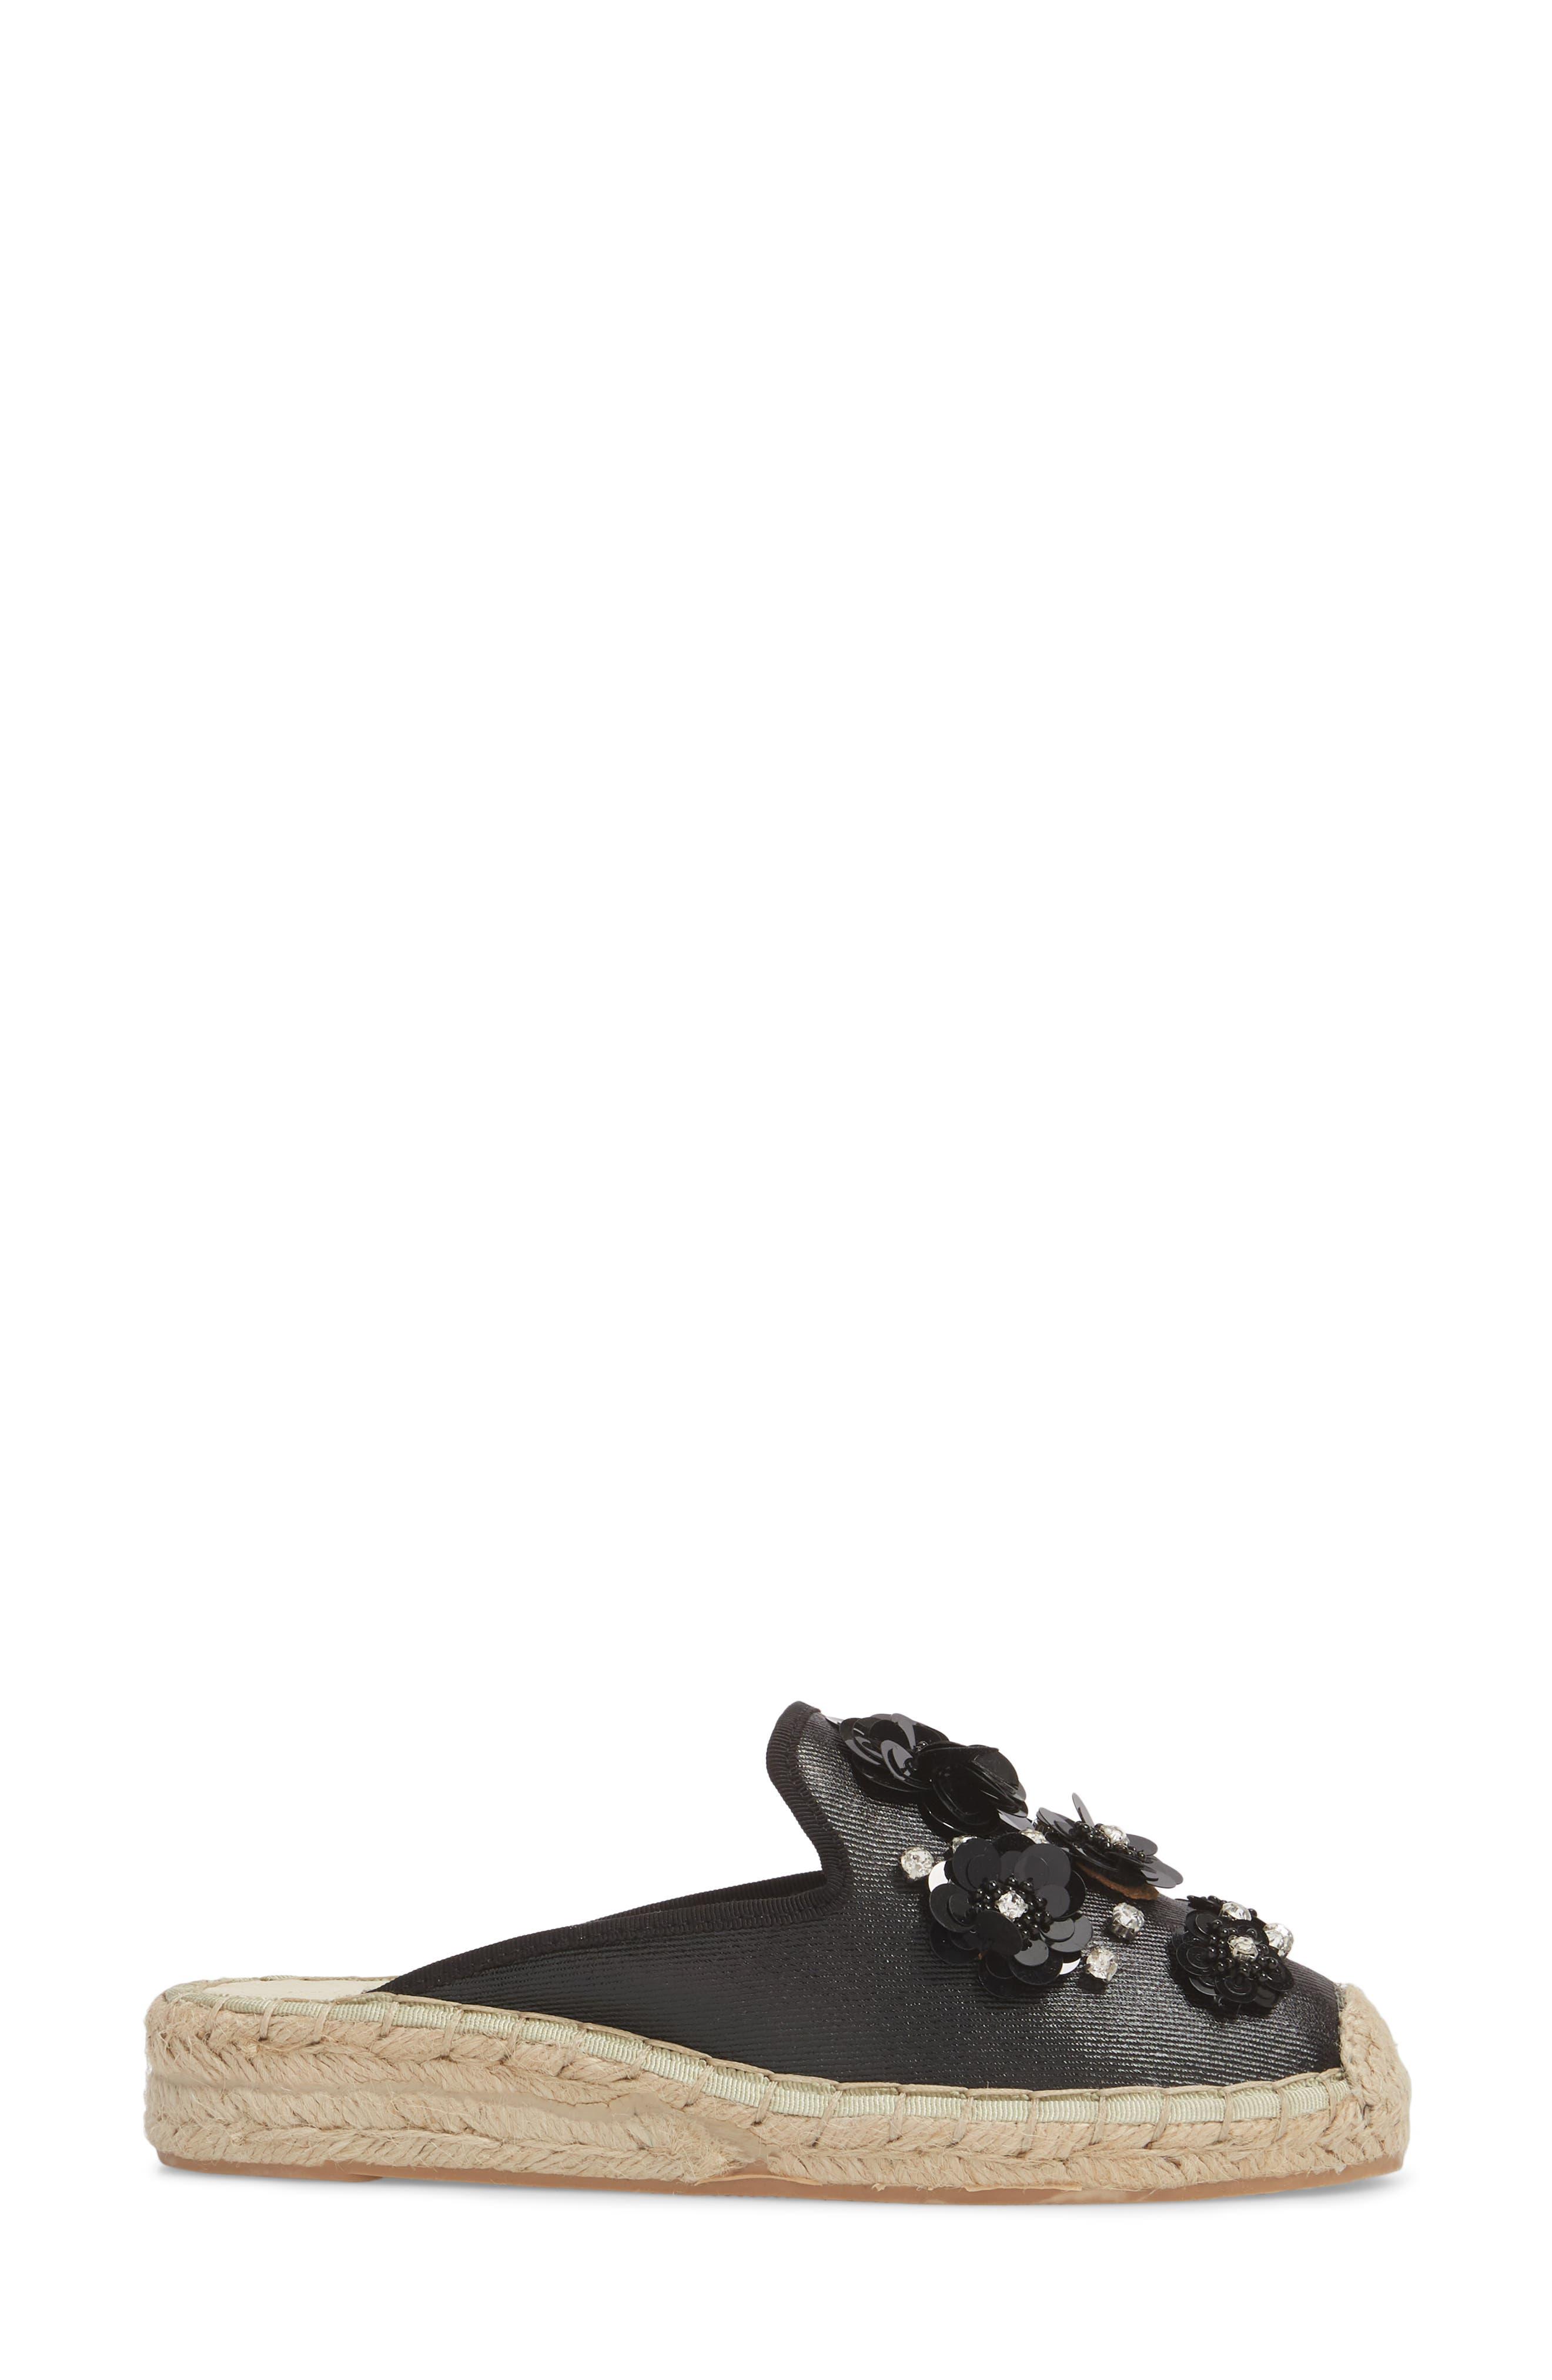 Tia Embellished Espadrille Mule,                             Alternate thumbnail 3, color,                             Black Fabric